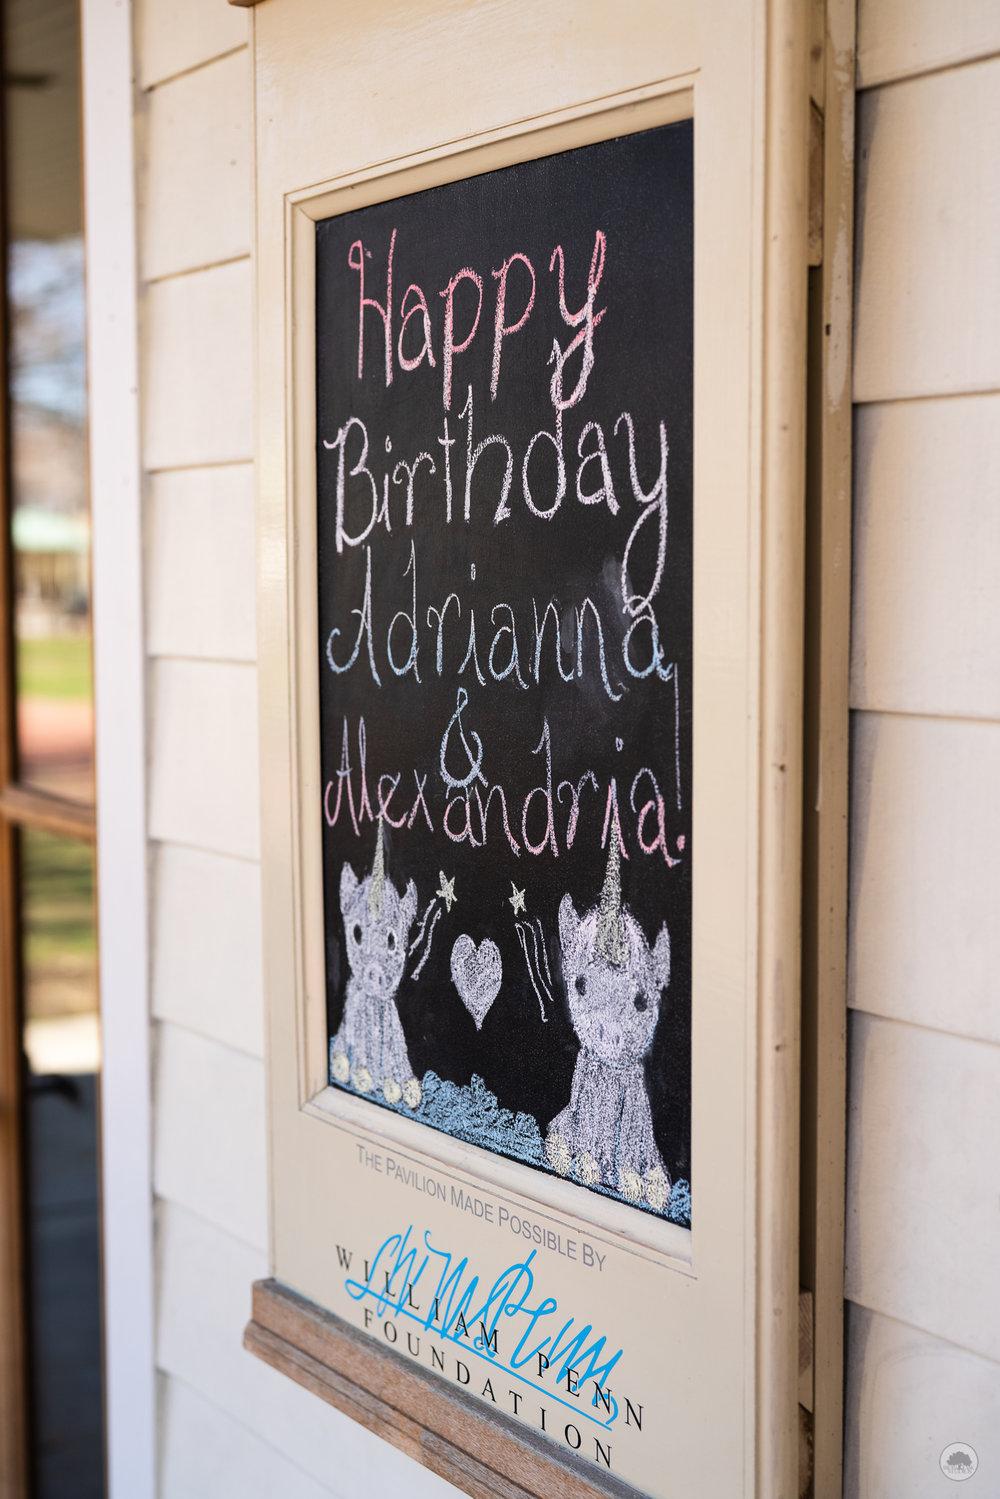 IronOakStudios_Salerno_Cake_Smash_Birthday_FranklinSquare_Pavilion (1 of 22).jpg